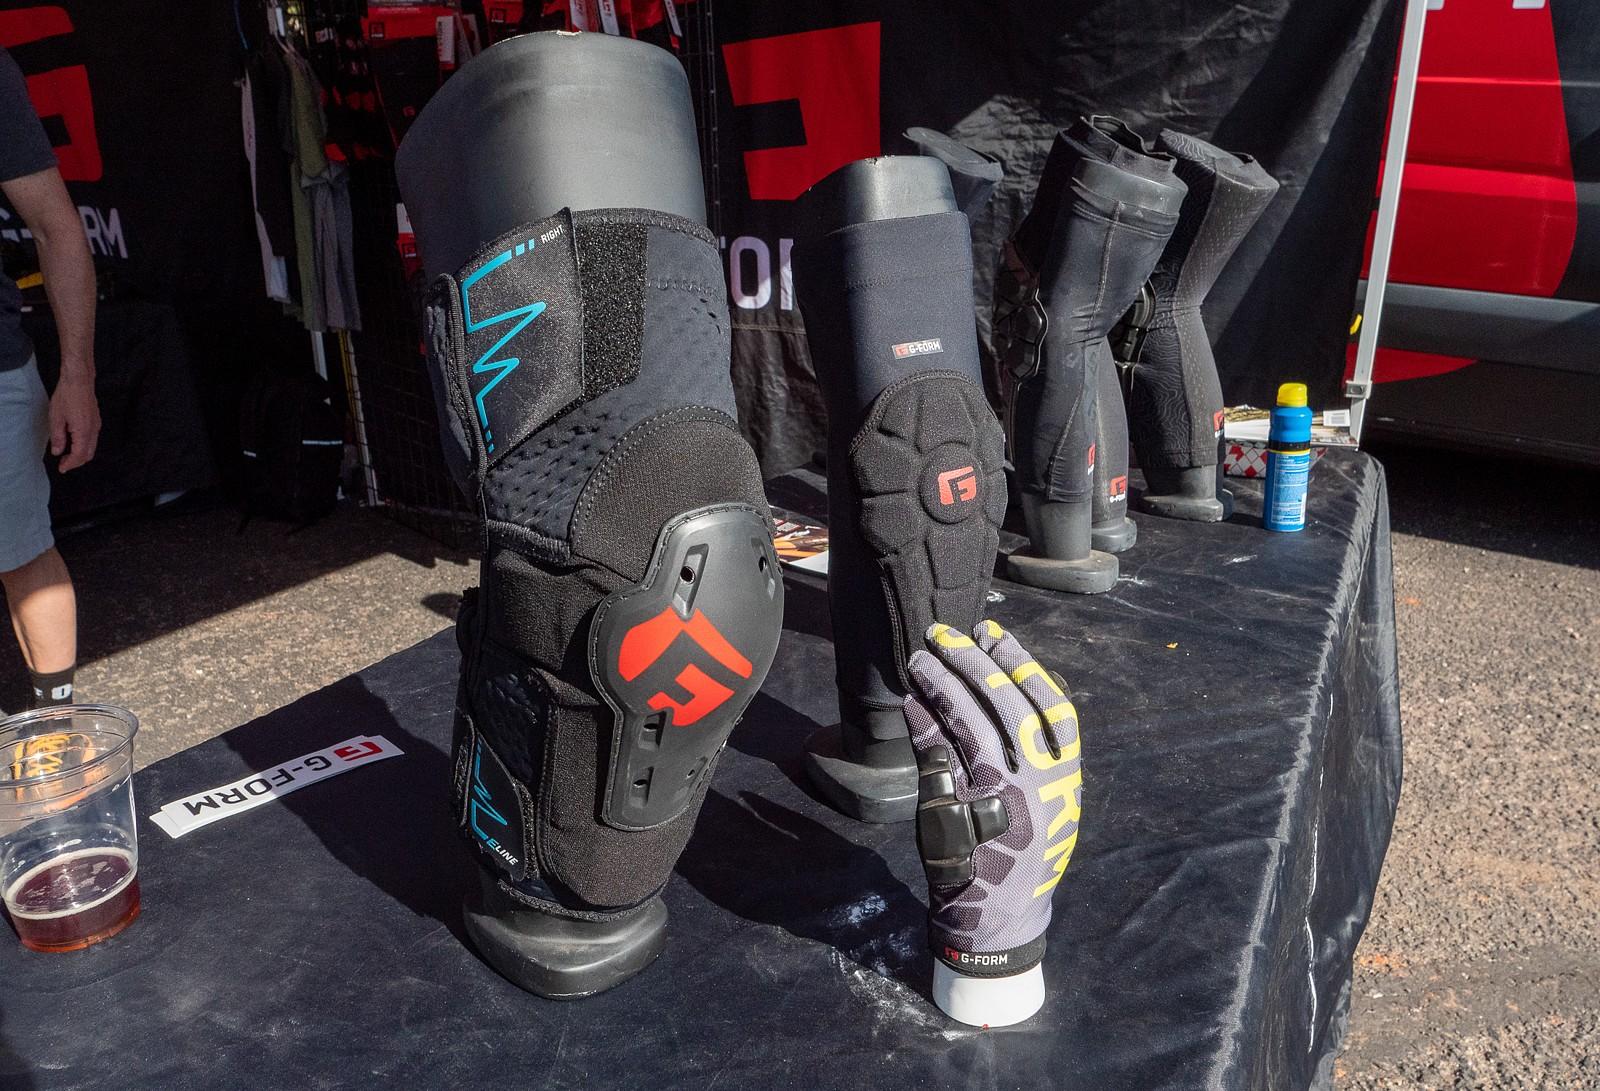 New G-Form E-Line Knee Pads and Gloves at Sedona Bike Fest - PIT BITS 2 - Sedona Bike Festival 2020 - Mountain Biking Pictures - Vital MTB